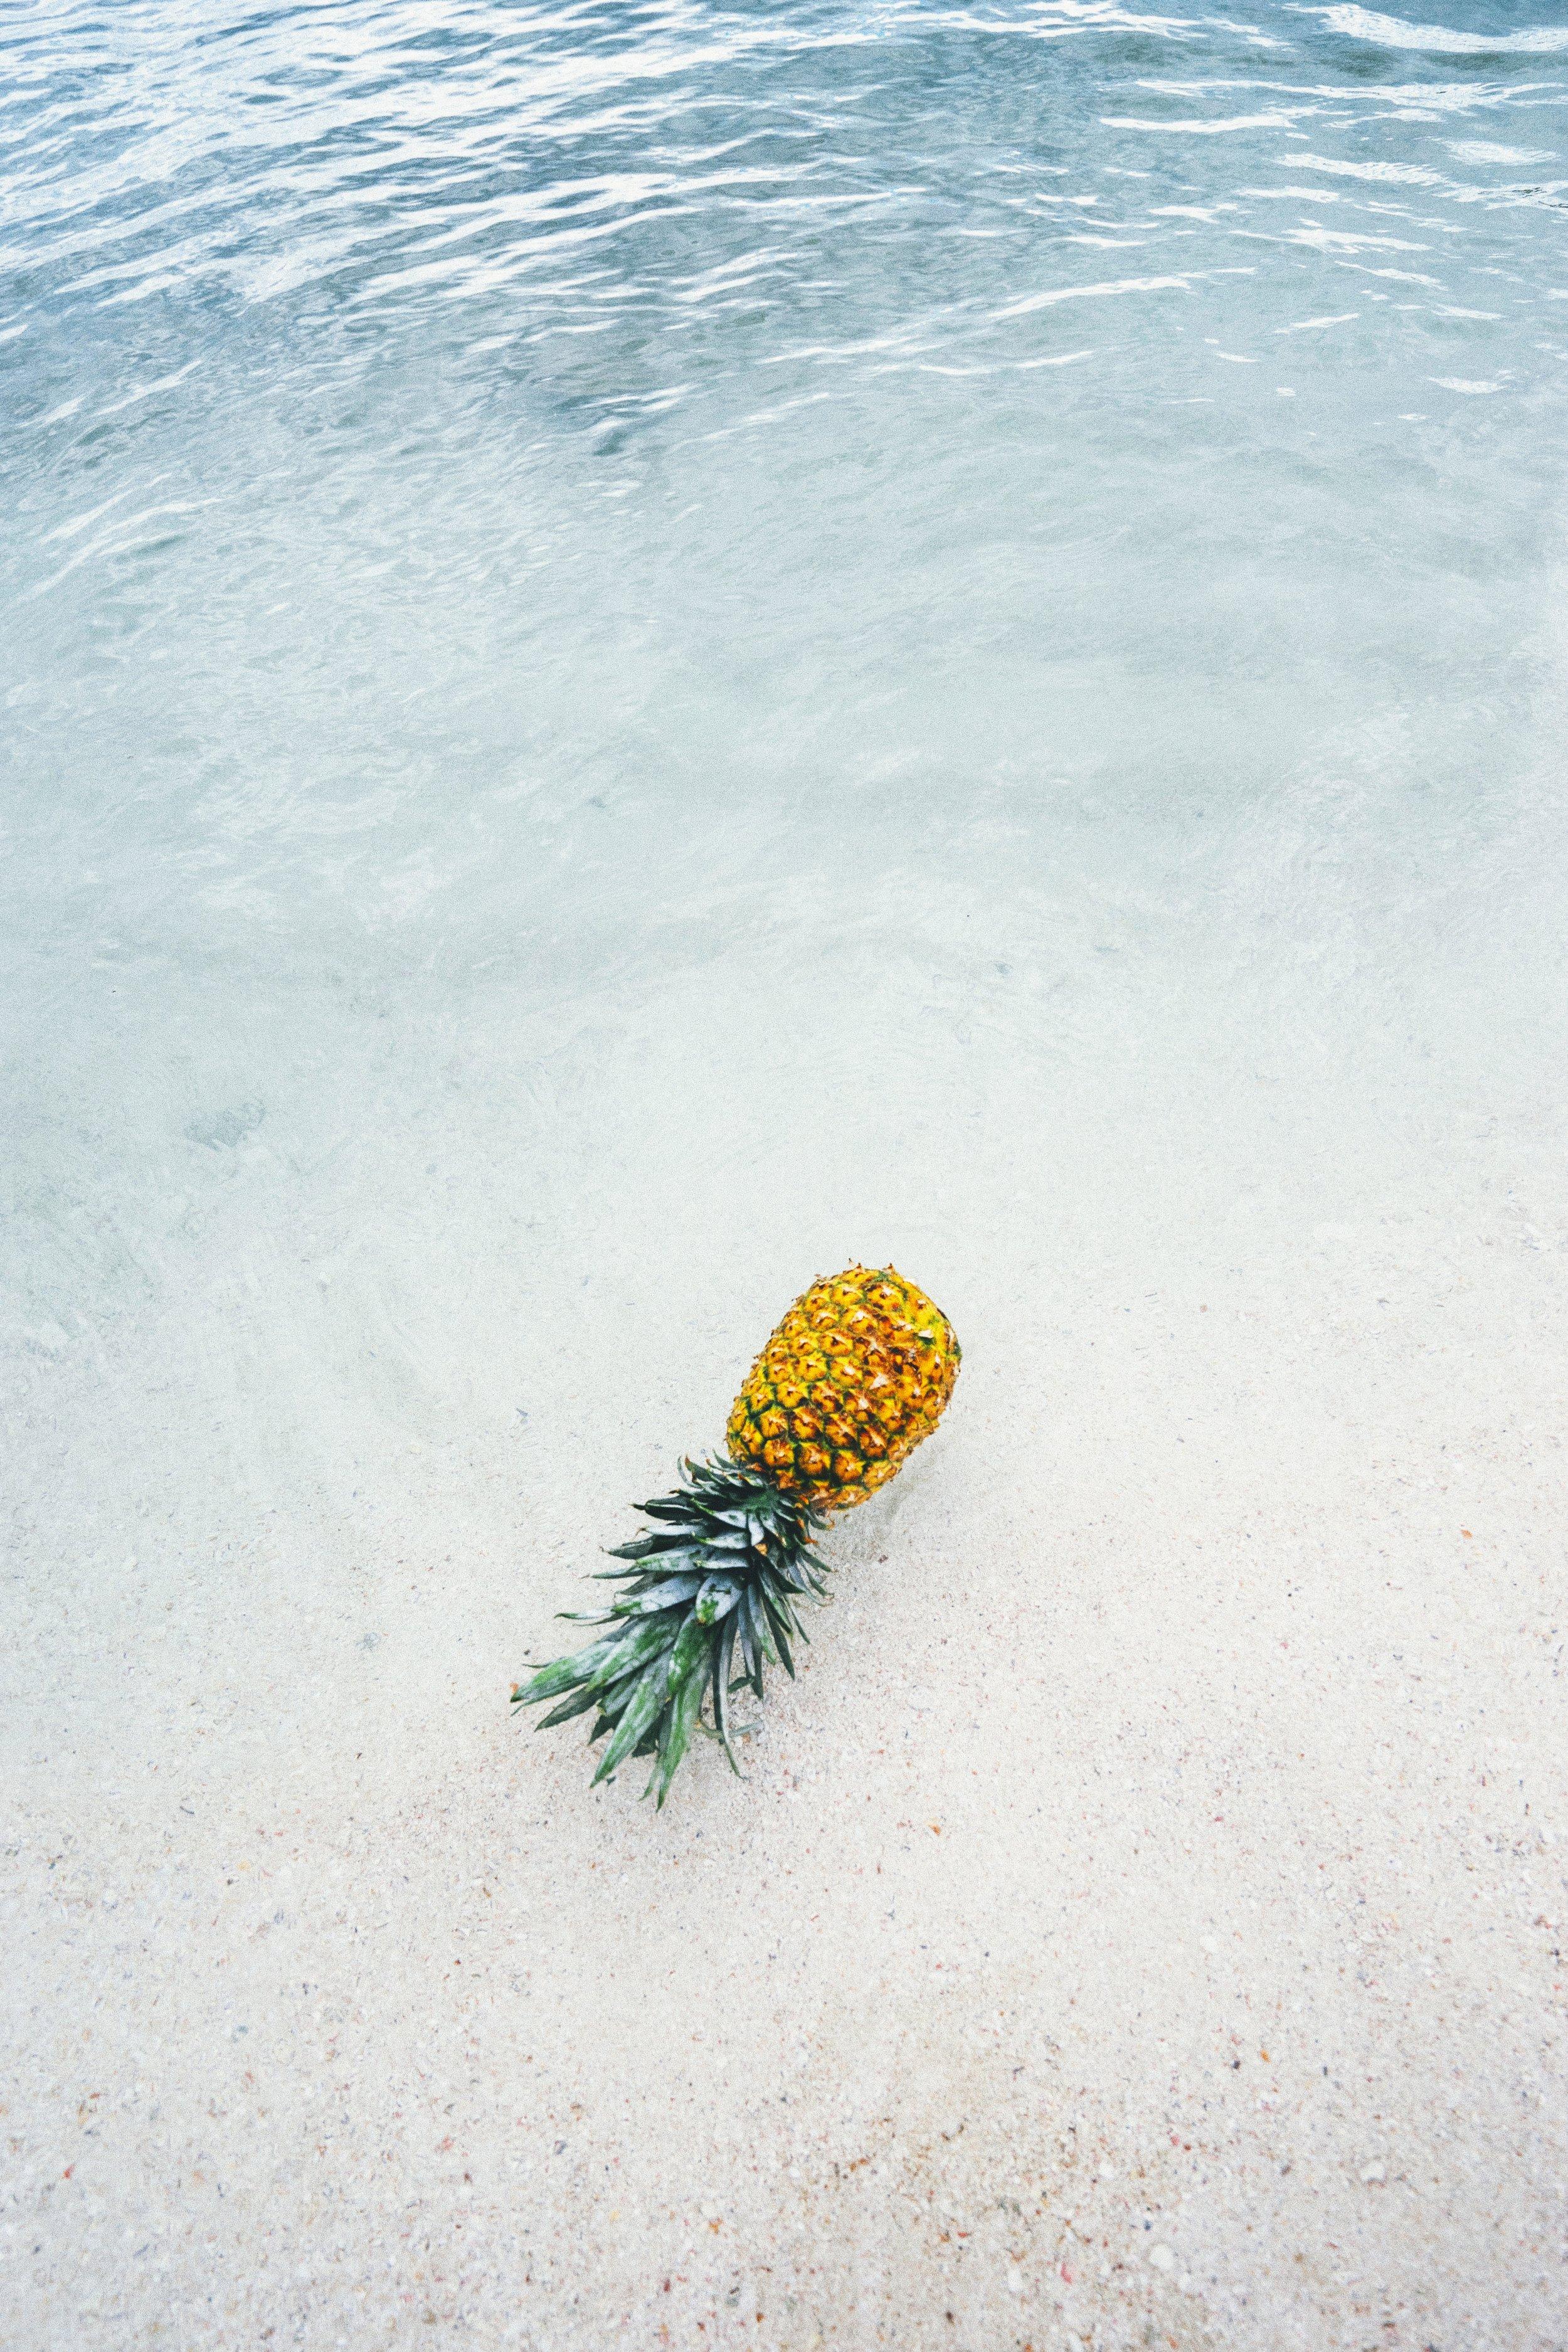 pineapple-supply-co-244468-unsplash.jpg